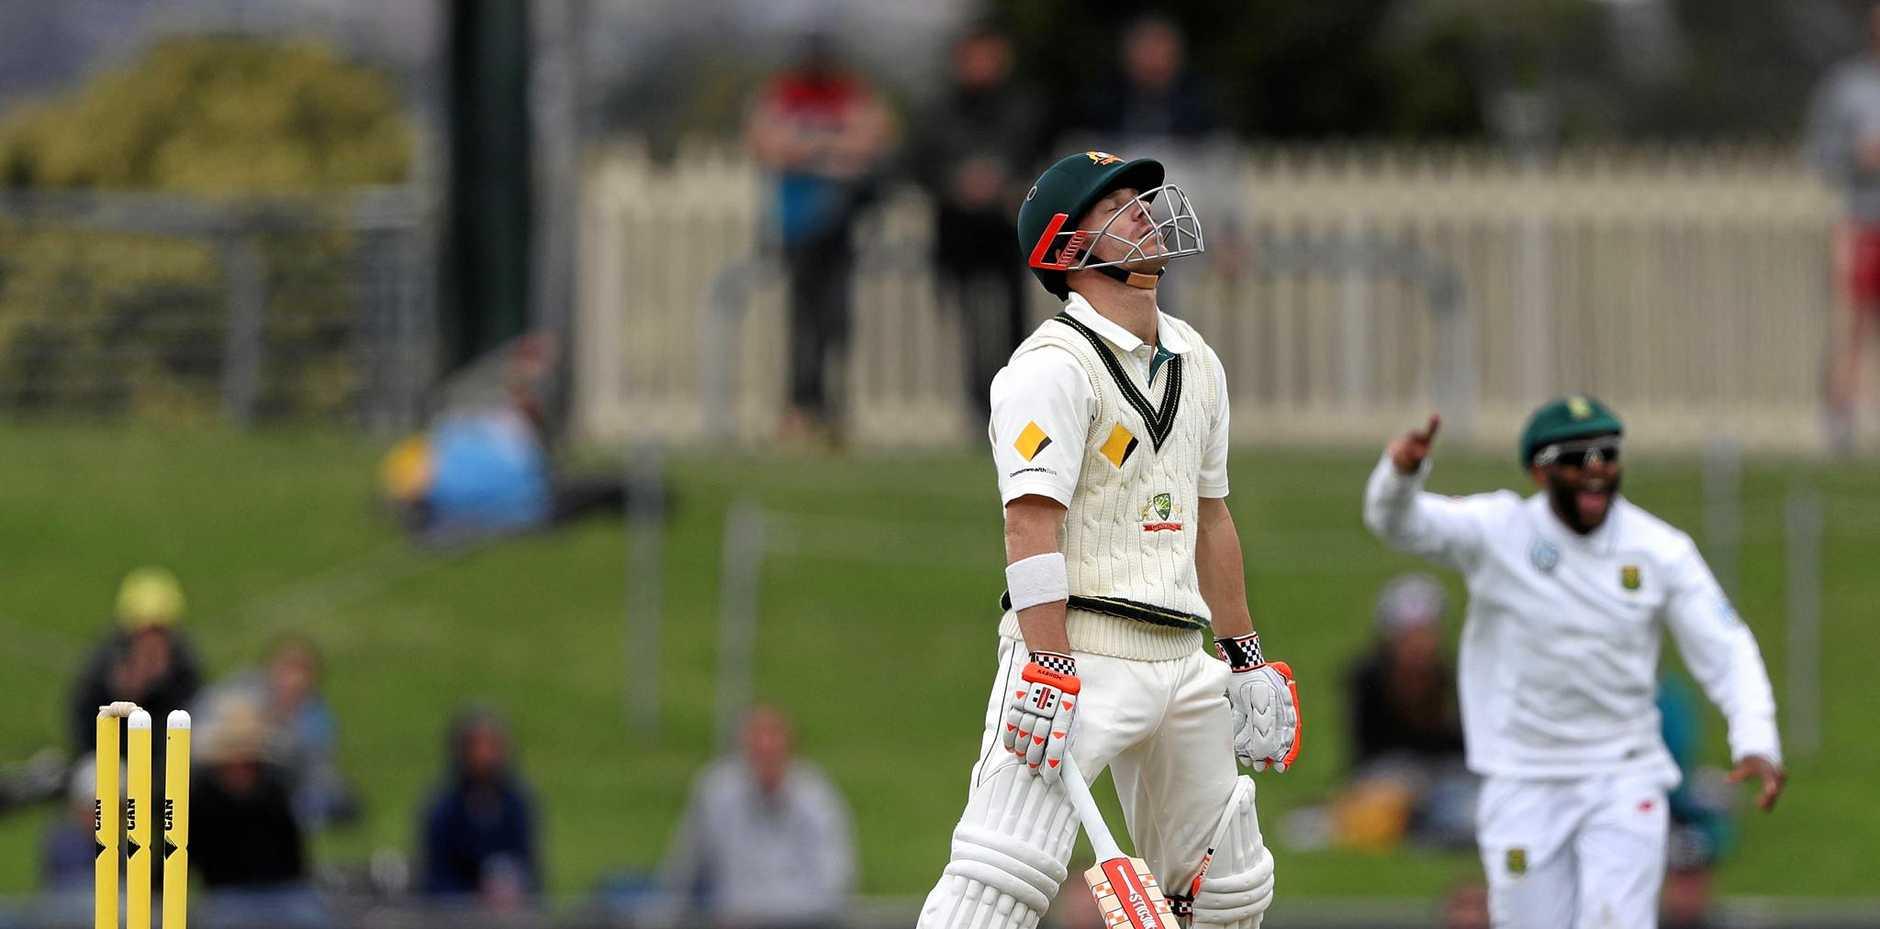 David Warner knows he's gone in Australia's second innings.